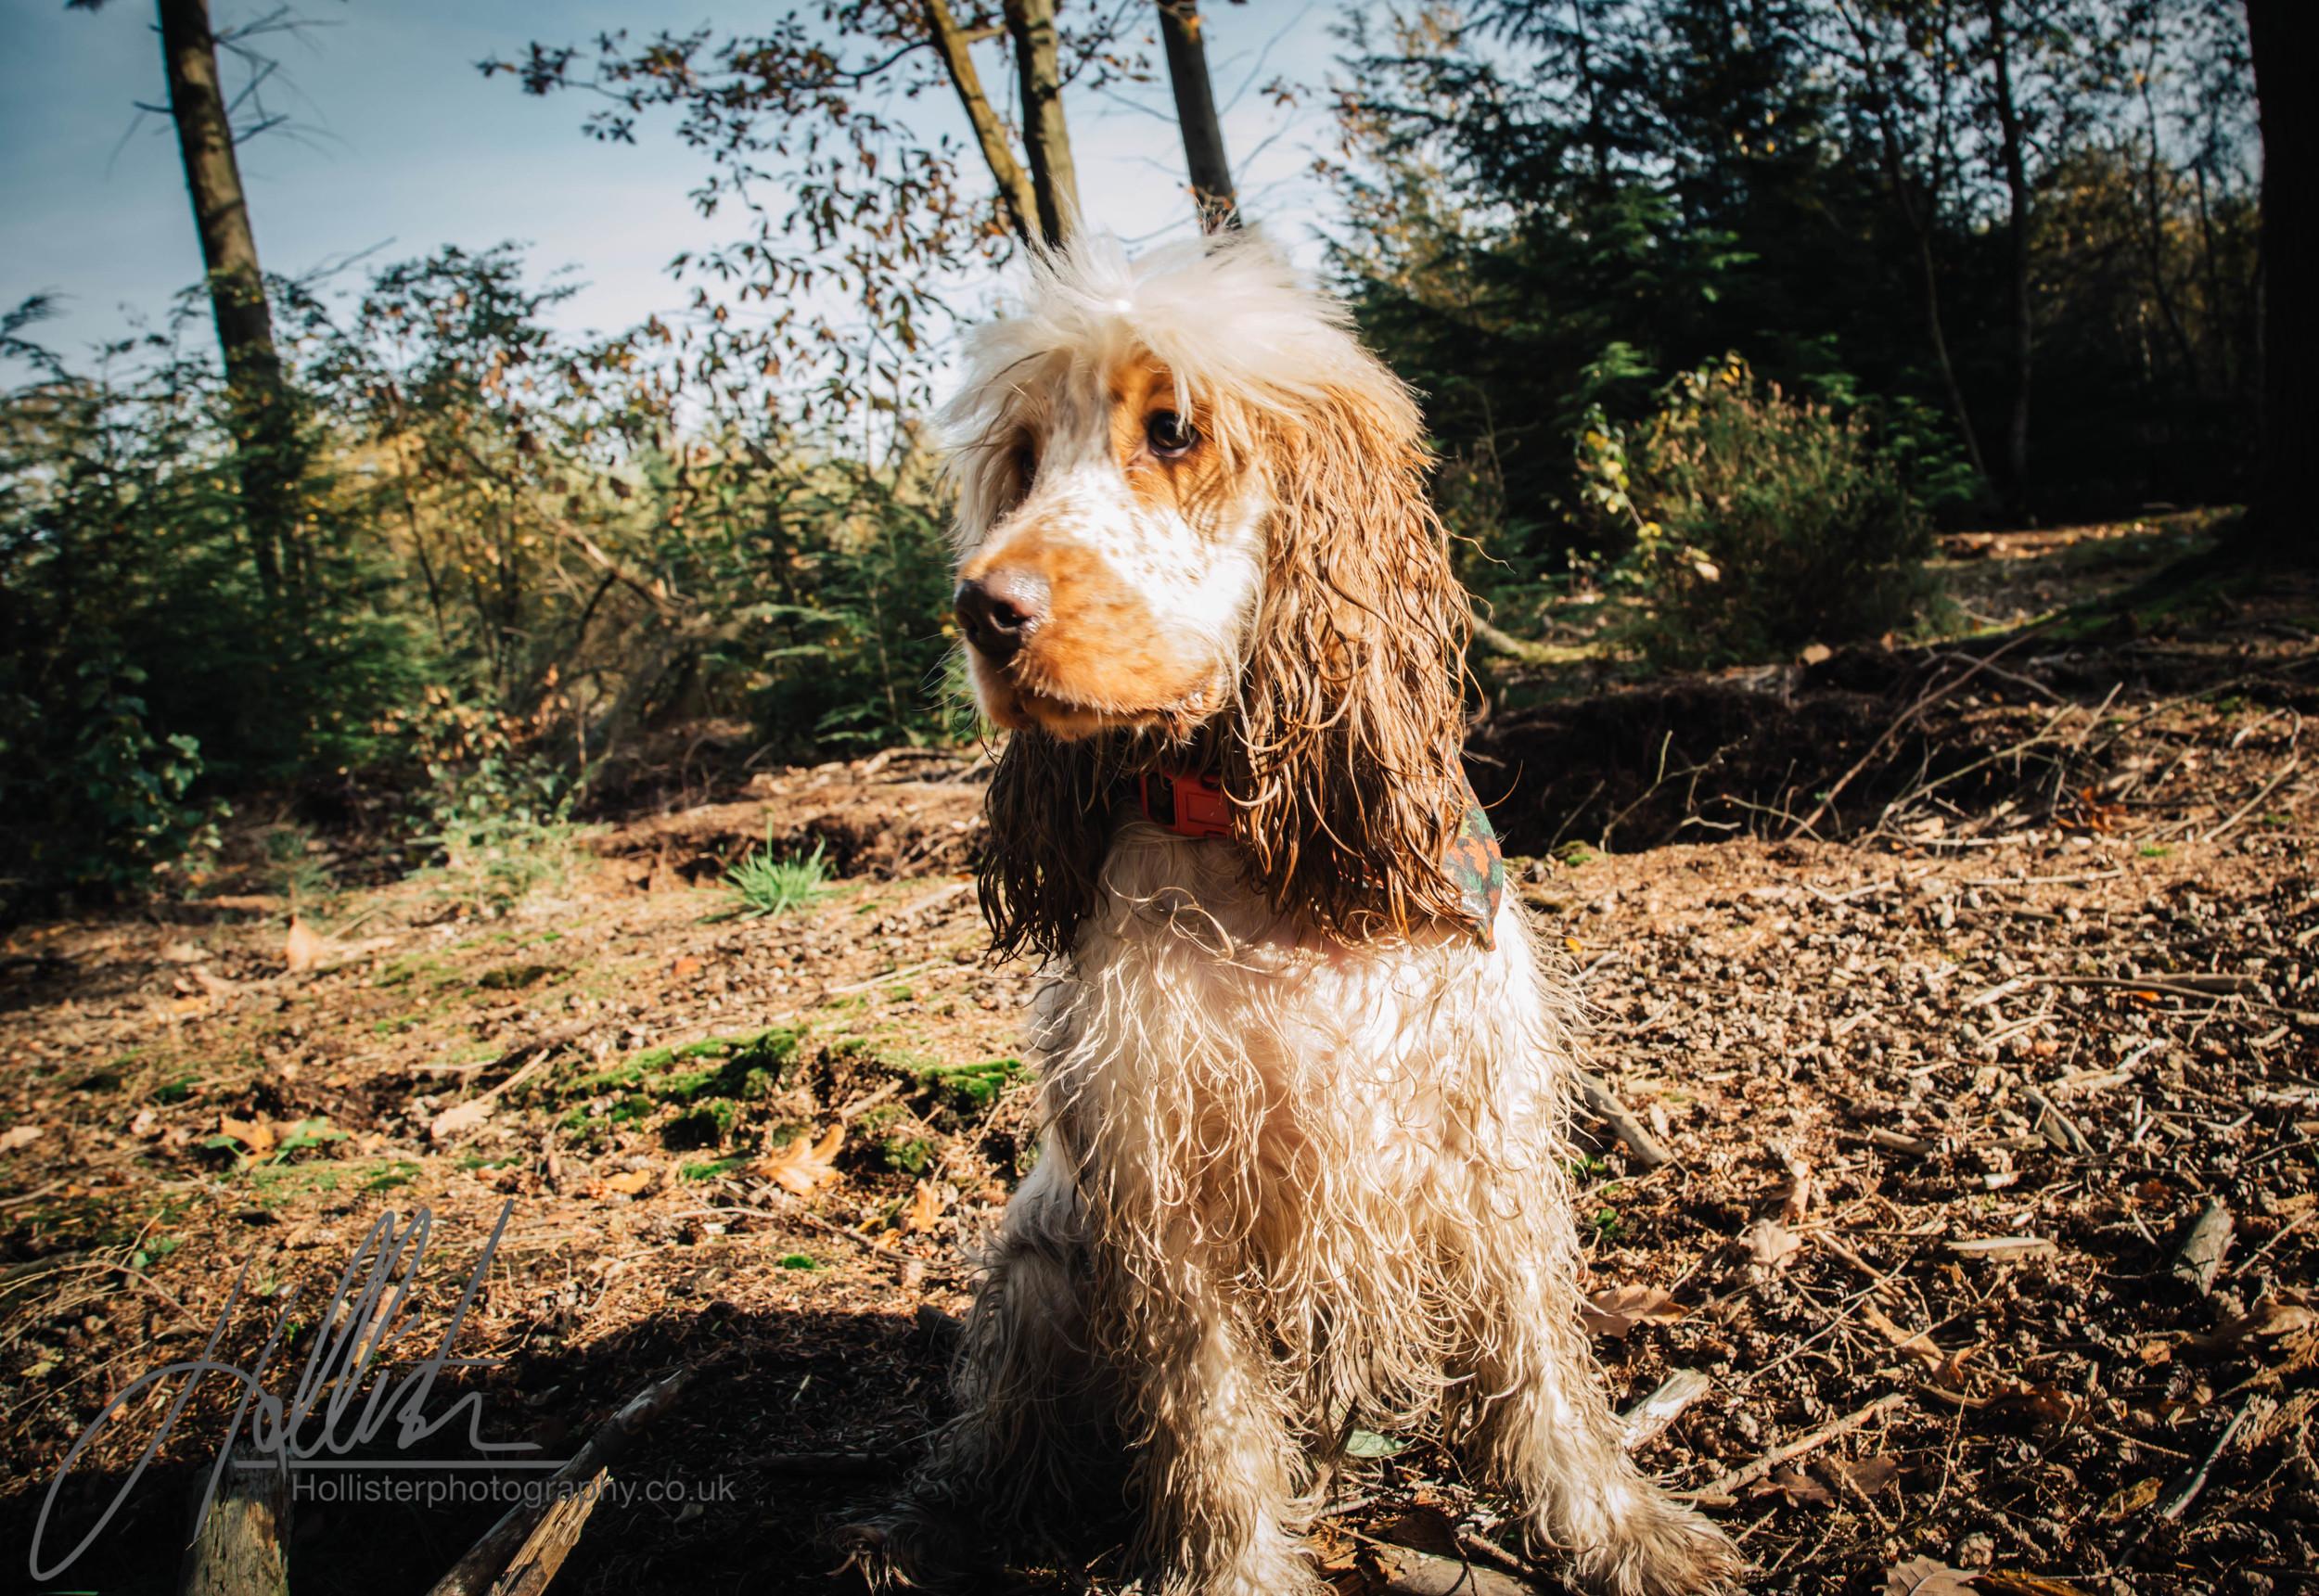 Hollisterphotography ABBY CLOWES WOOD DOG WALK-57.JPG